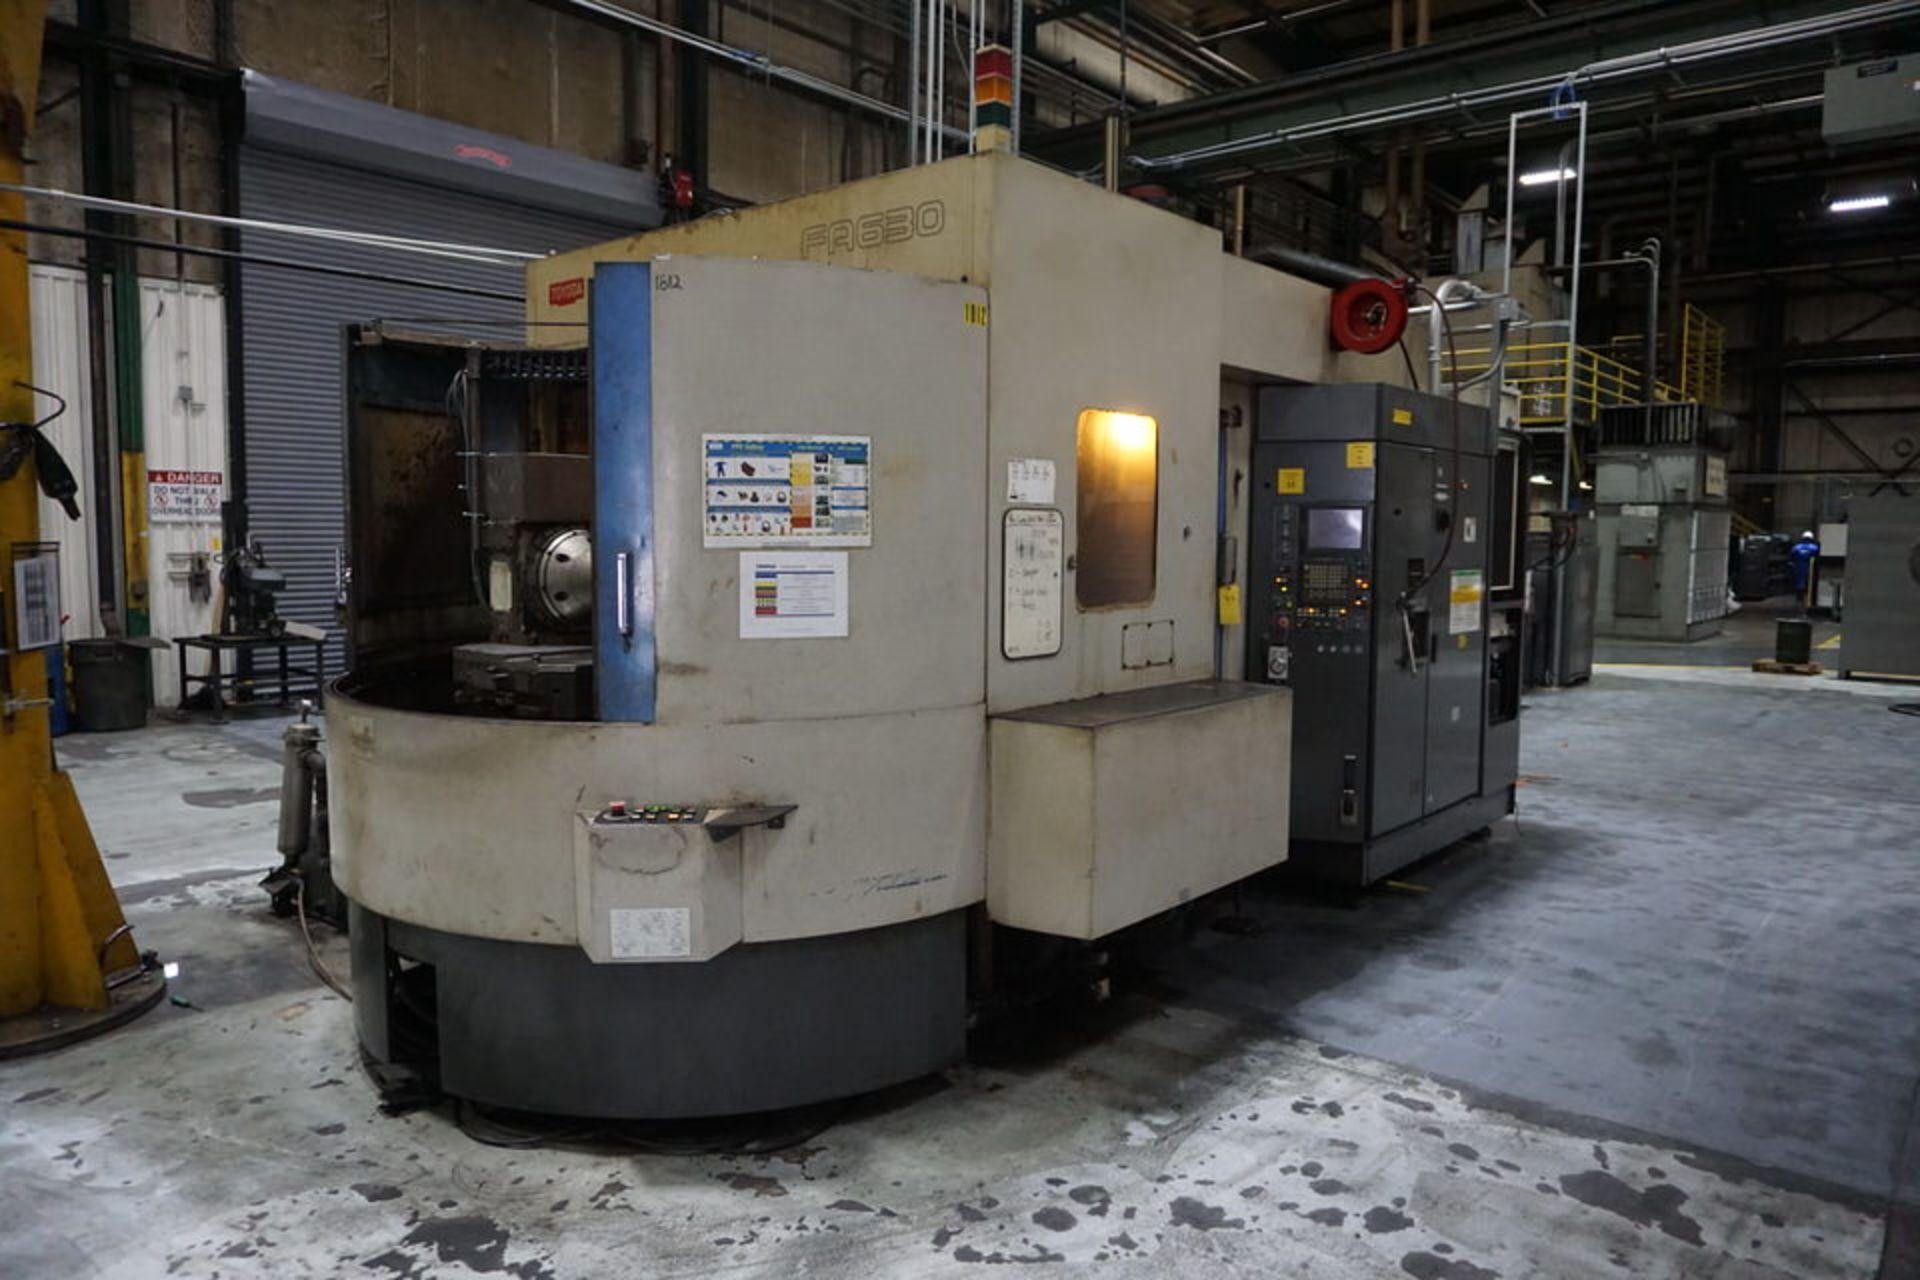 TOYODA HORIZONTAL MILLING MACHINE, DOM:1998 (ASST#: P772100)